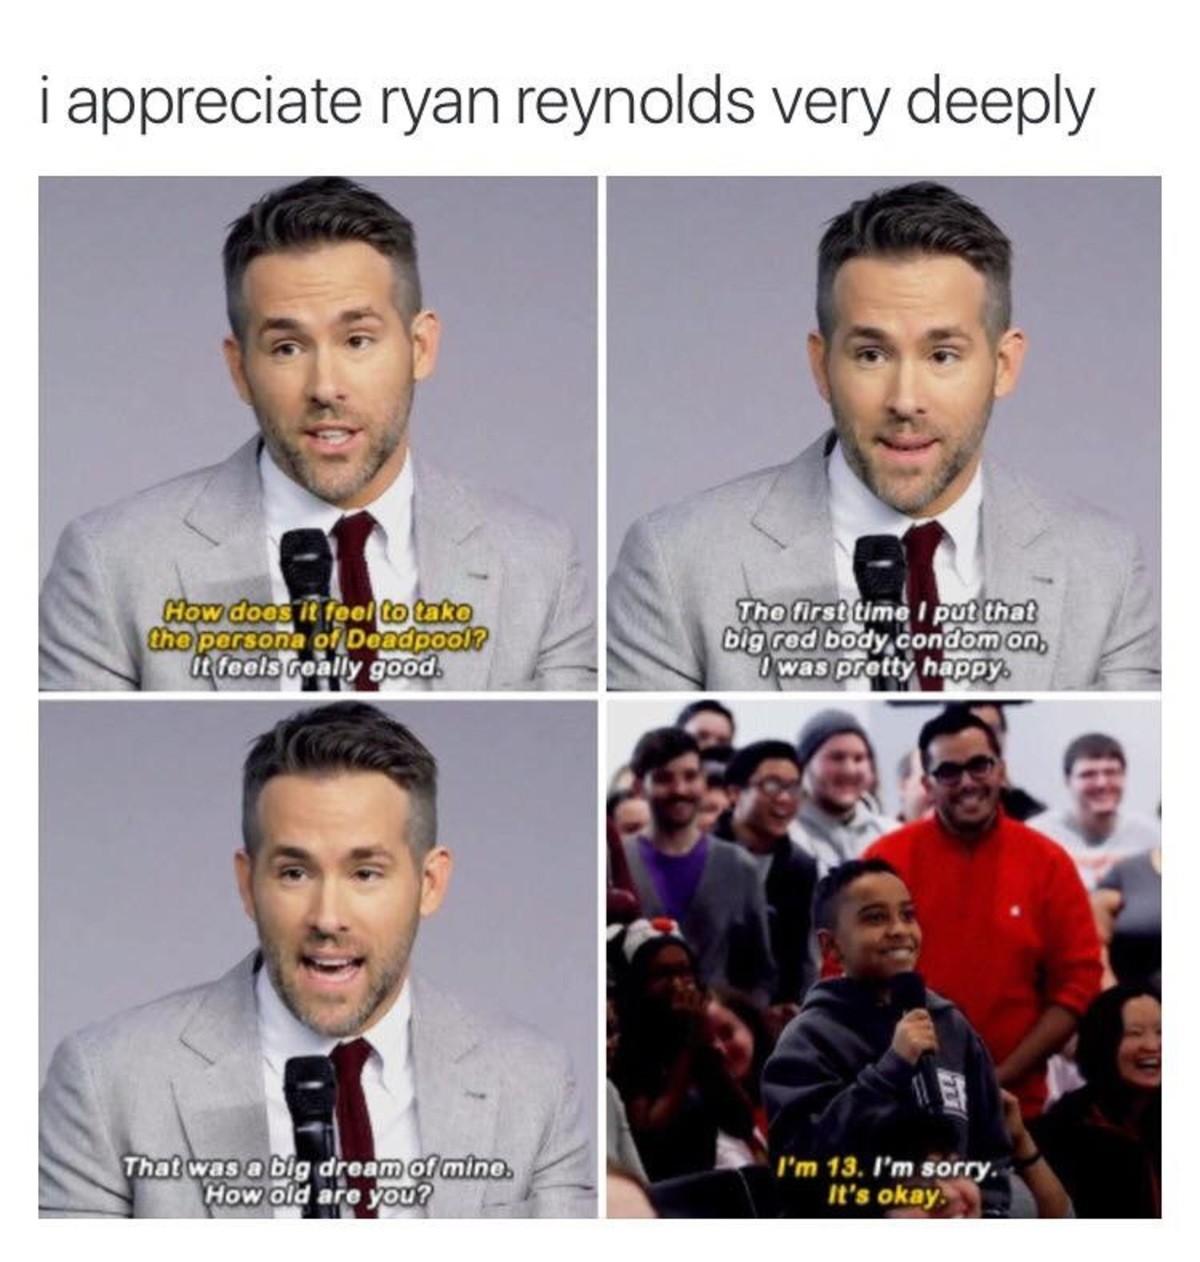 "Ryan Reynolds is a nice guy. . i appreciate / an very deeply rhe, twyst ttritt-.'/ bit; red oii? iiy, cnn' itifoi. iah:""' I' laas preatty happy}?. Let's all praise the murderer of an innocent stuntgirl Ryan Reynolds is a nice guy i appreciate / an very deeply rhe twyst ttritt- '/ bit; red oii? iiy cnn' itifoi iah:""' I' laas preatty happy}? Let's all praise the murderer of innocent stuntgirl"